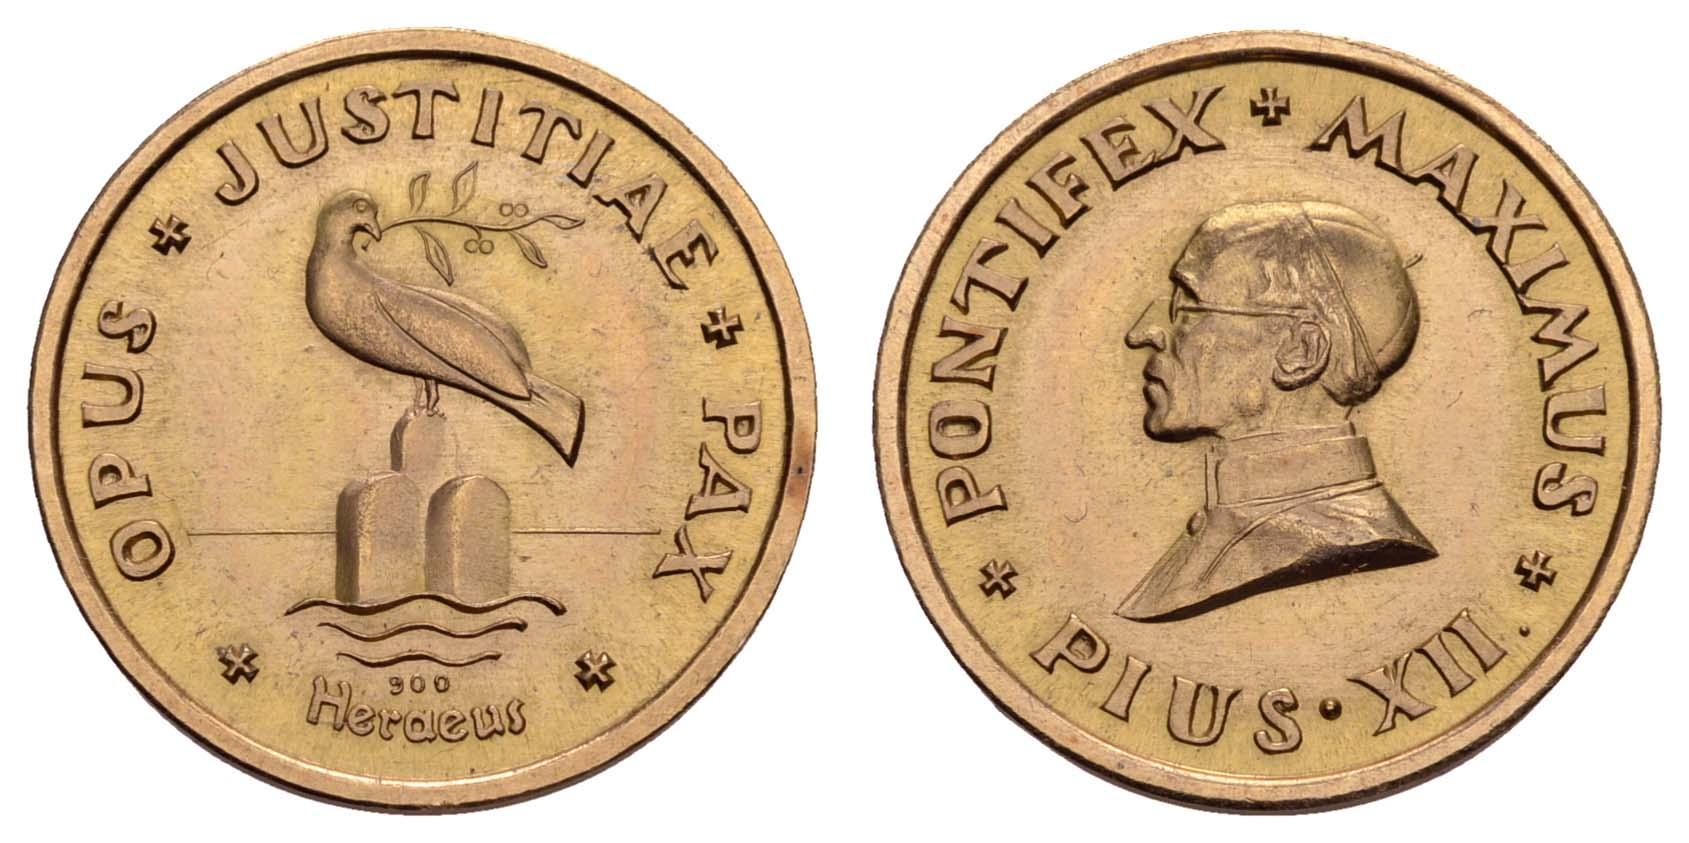 Lot 2194 - medaillen Gold-, Platin- und Palladiummedaillen - Europa -  Auktionshaus Ulrich Felzmann GmbH & Co. KG Coins single lots